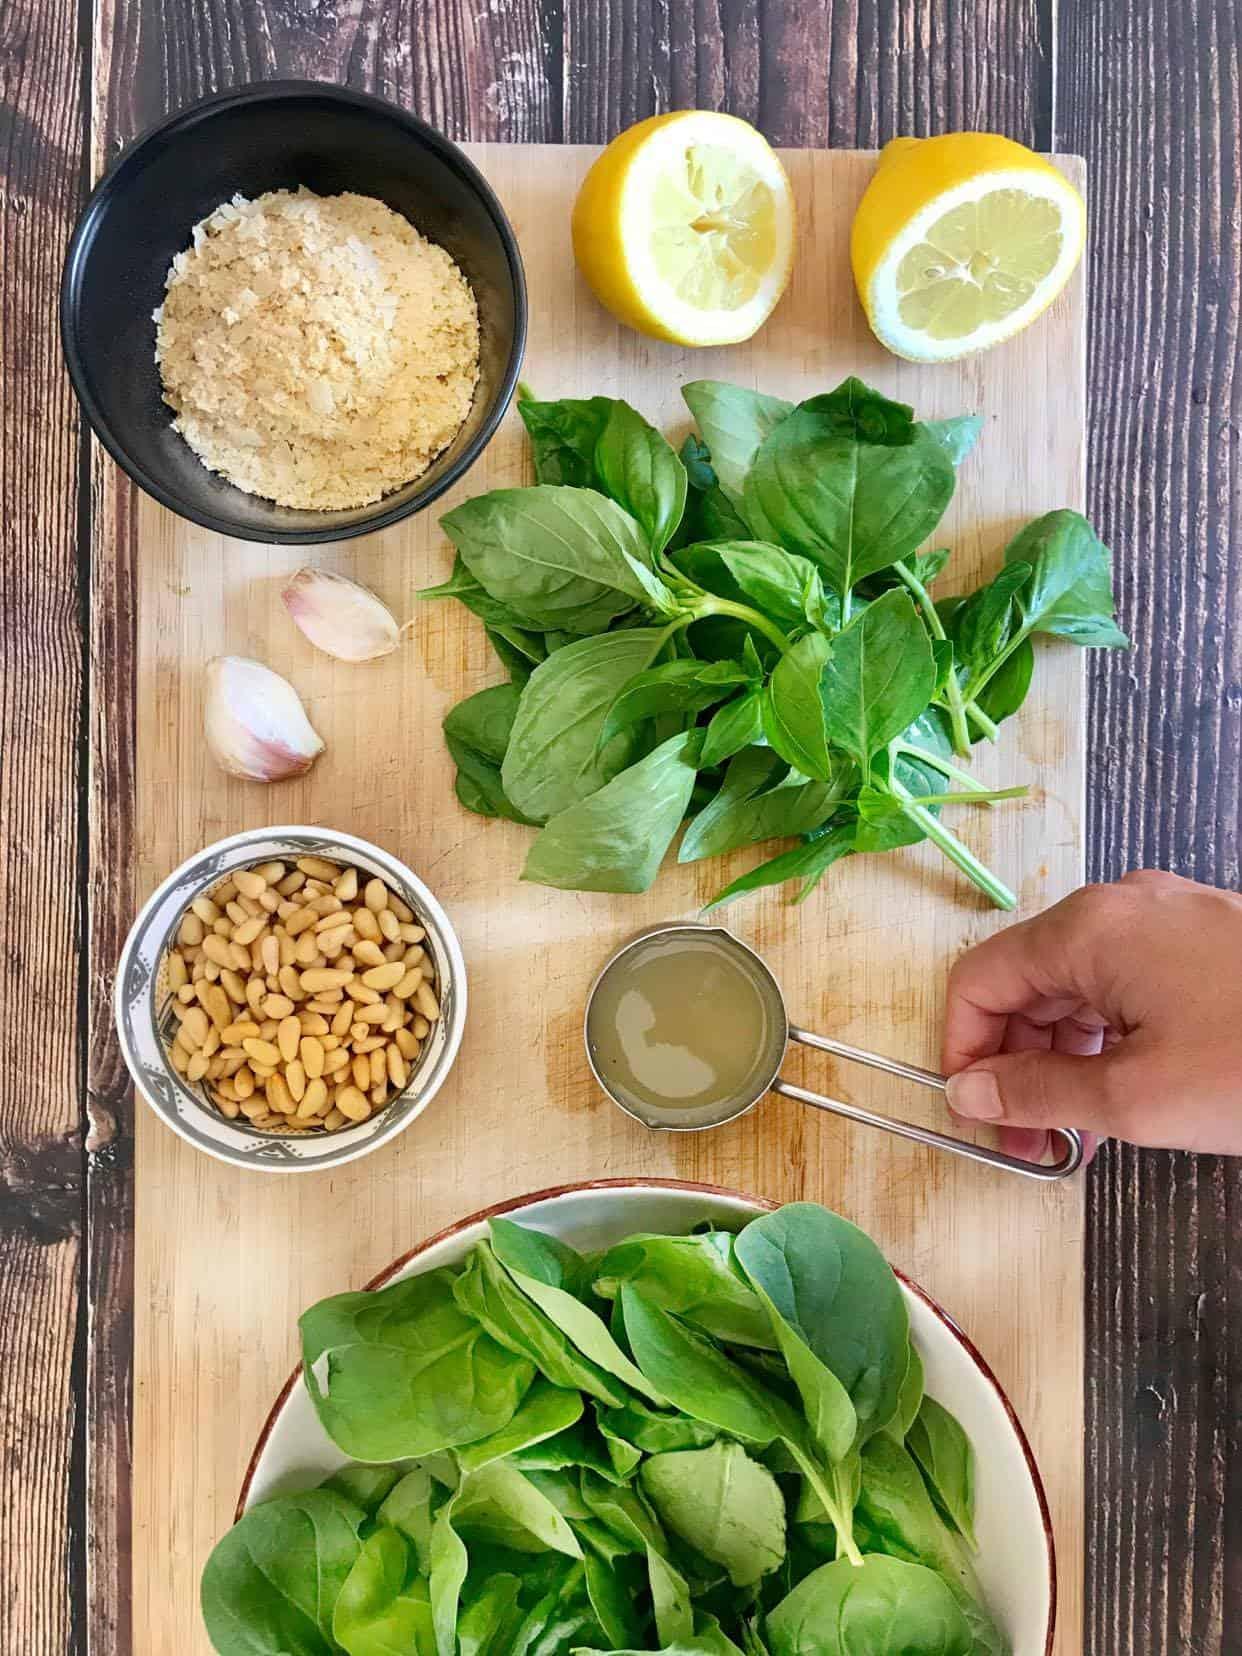 Oil-free vegan pesto ingredients (lemon juice, nutritional yeast, basil, garlic, pine nuts, aquafaba, and spinach).